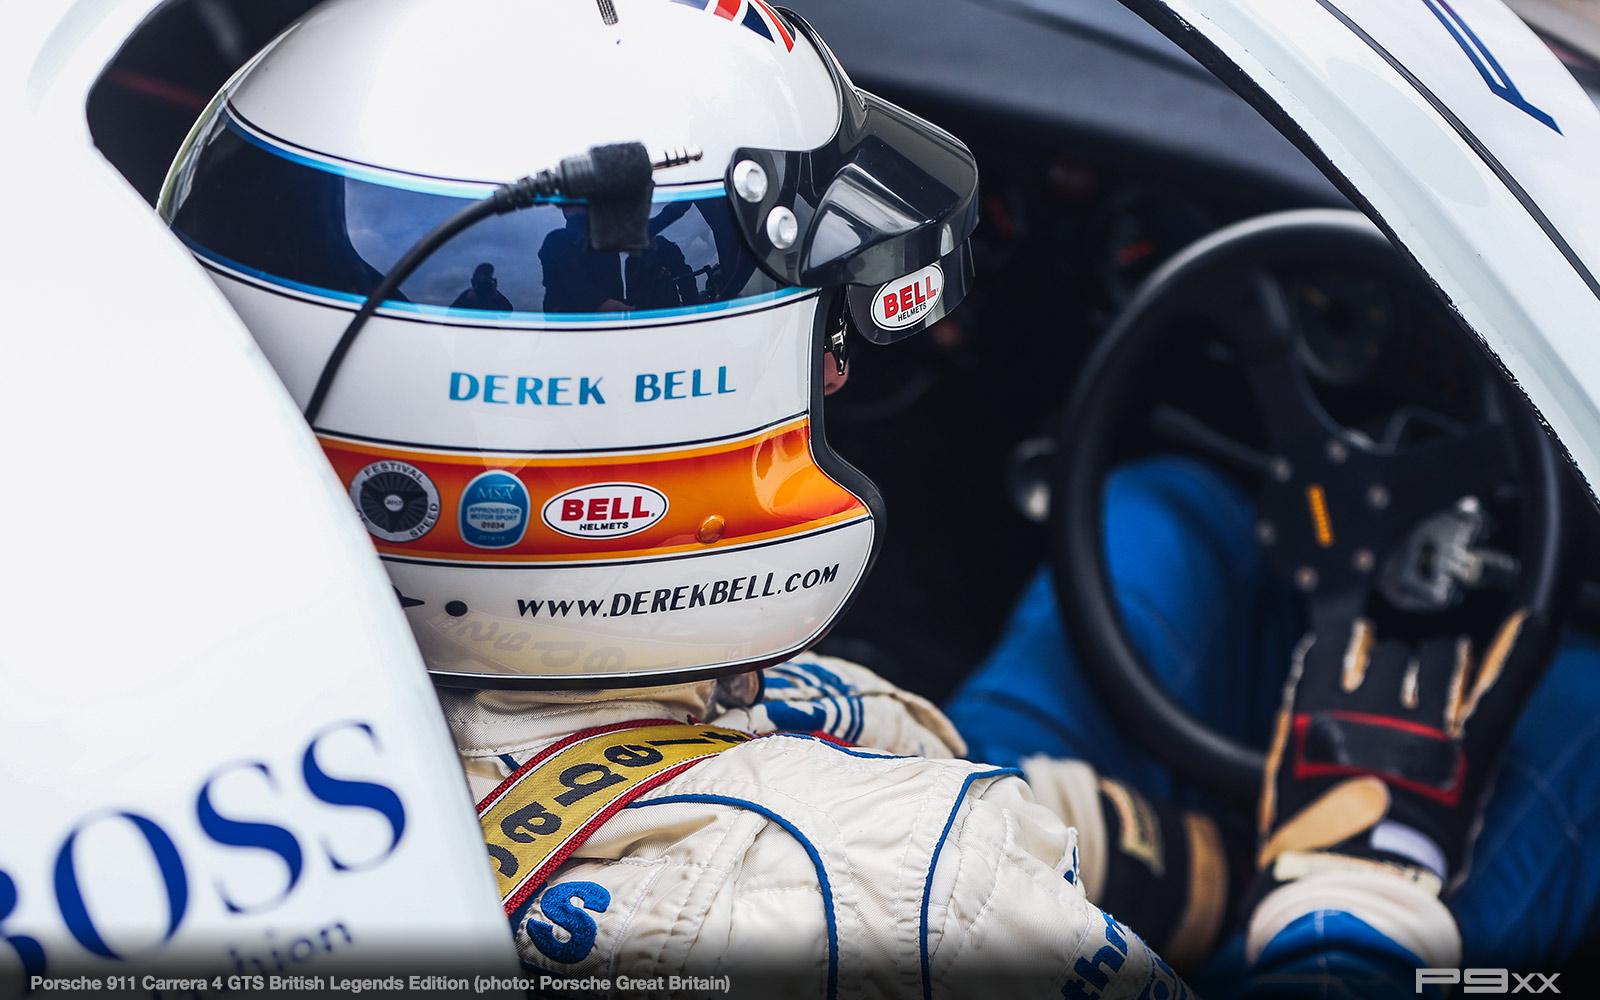 Porsche-911-Carrera-4-GTS-British-Legends-Edition-376